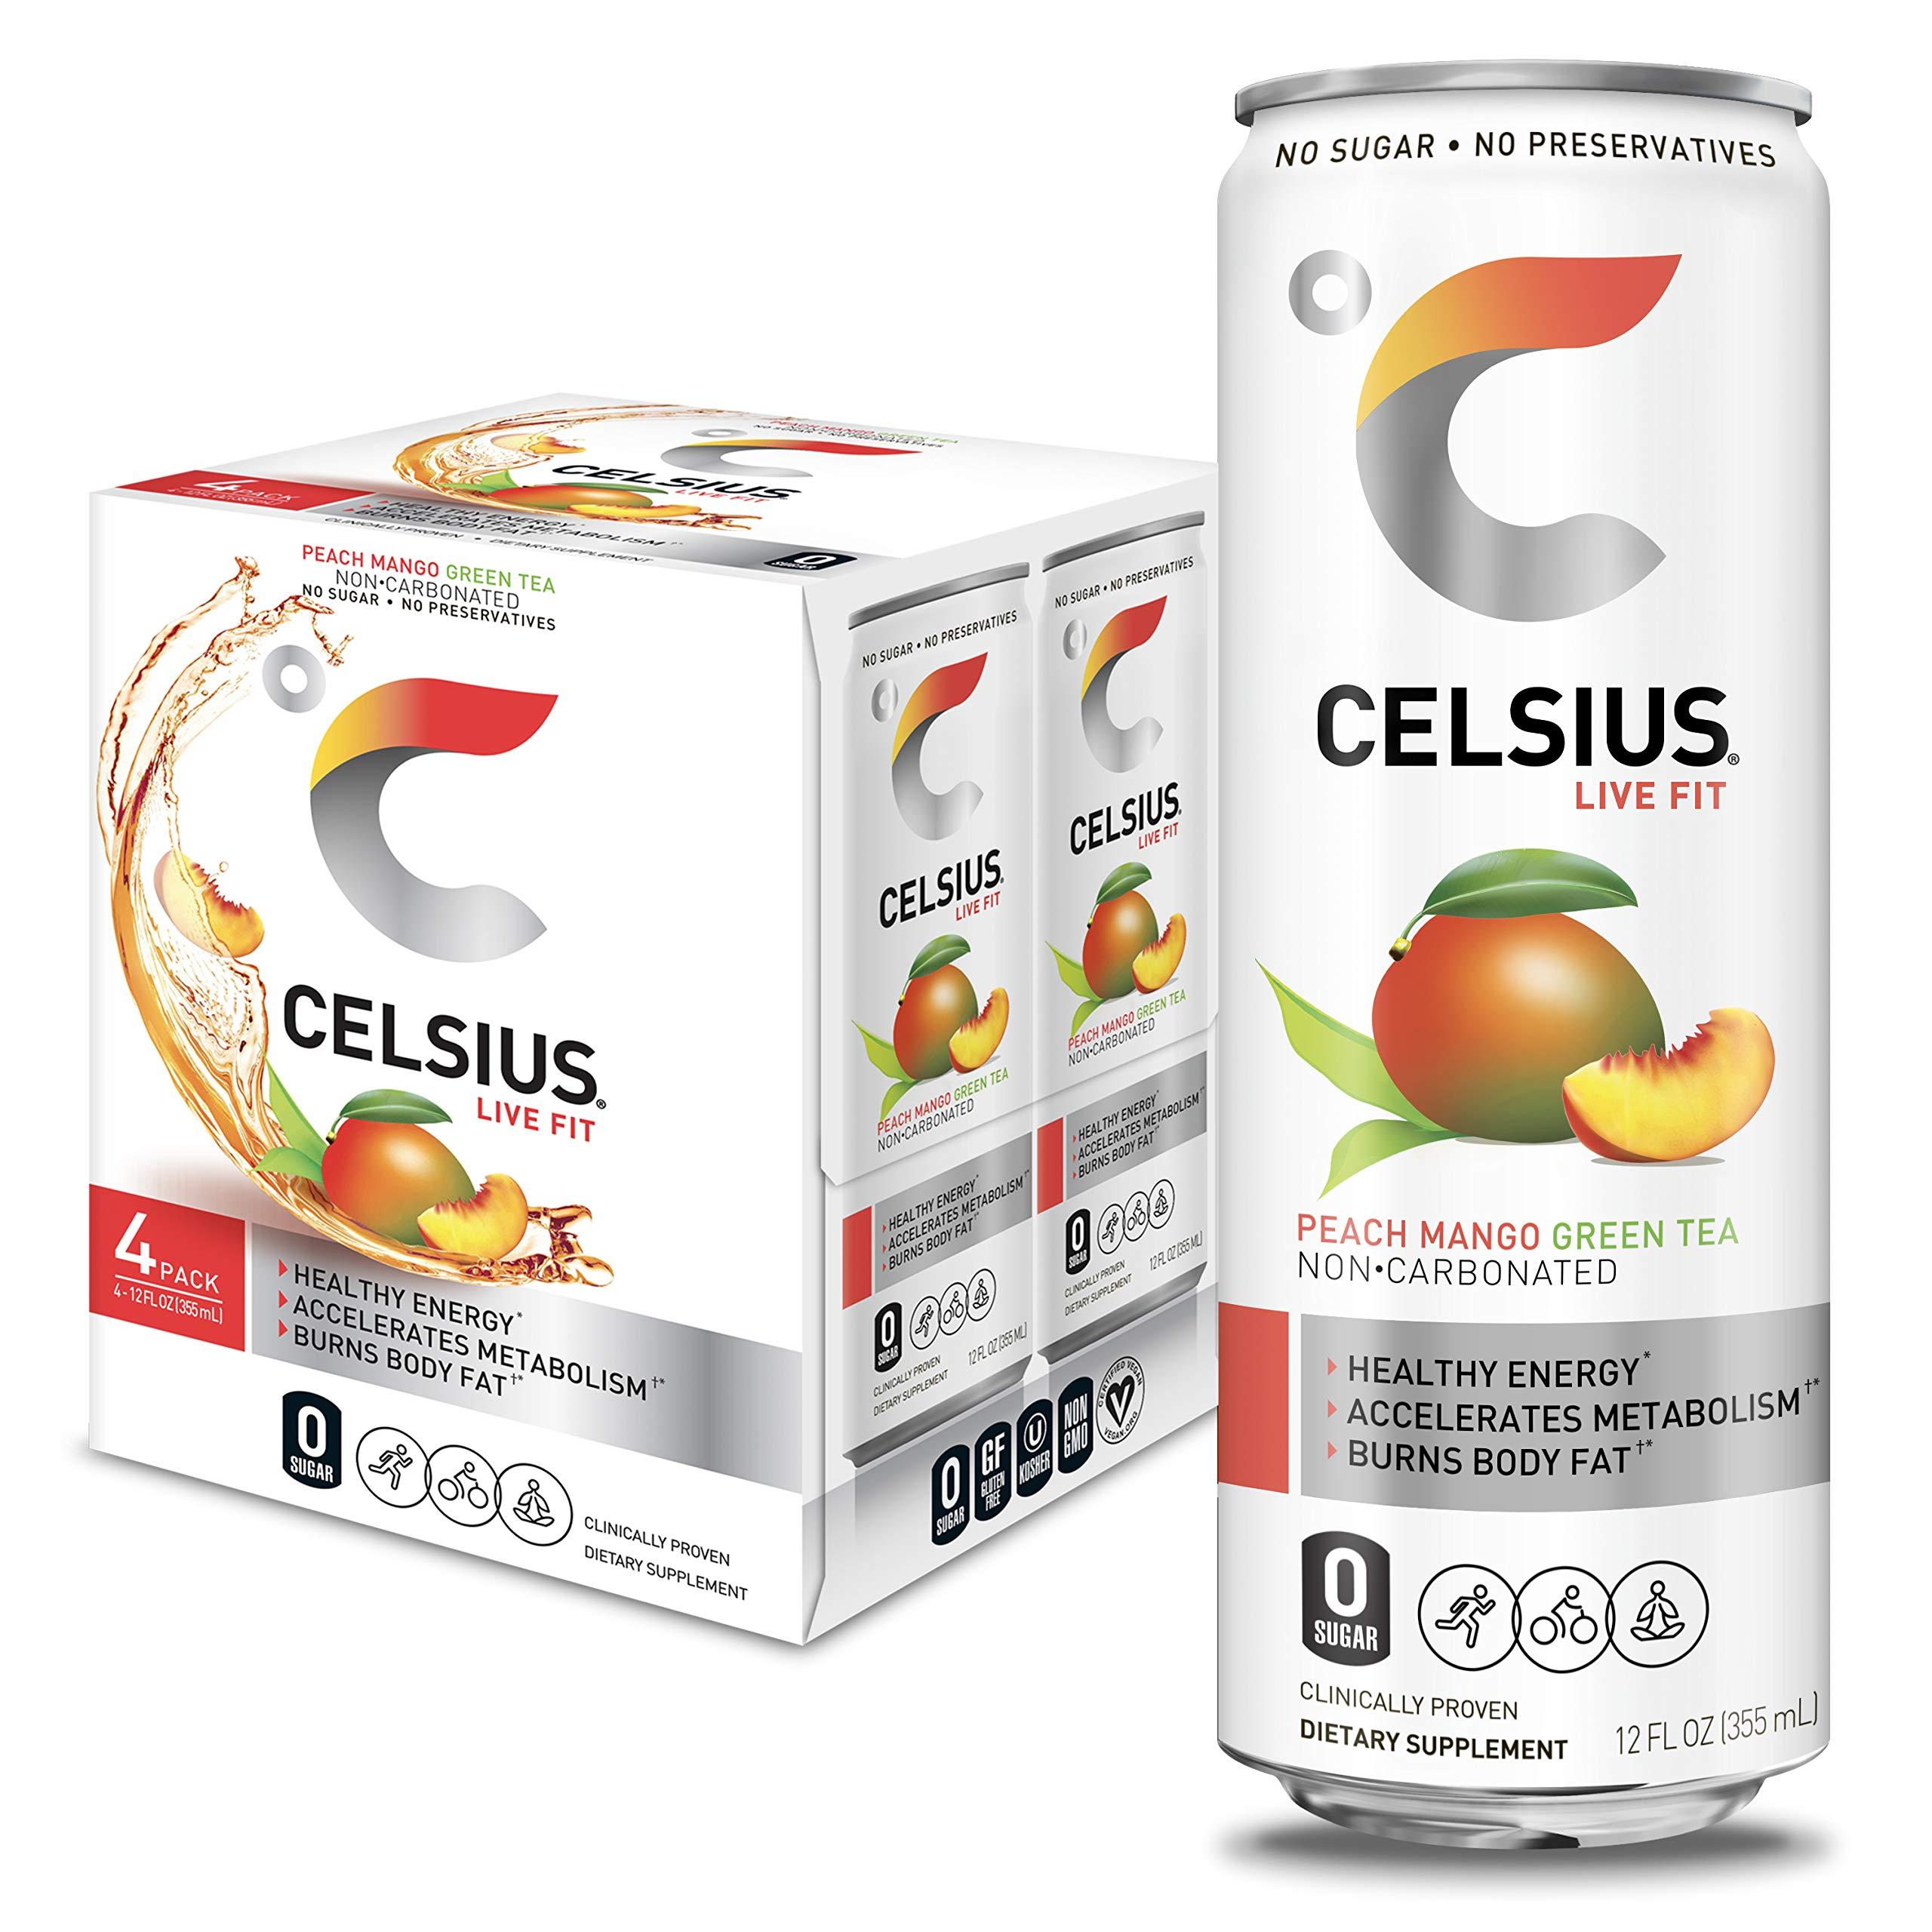 CELSIUS Peach Mango Green Tea Non-Carbonated Fitness Drink, Zero Sugar, 12oz. Slim Can (Pack of 4)